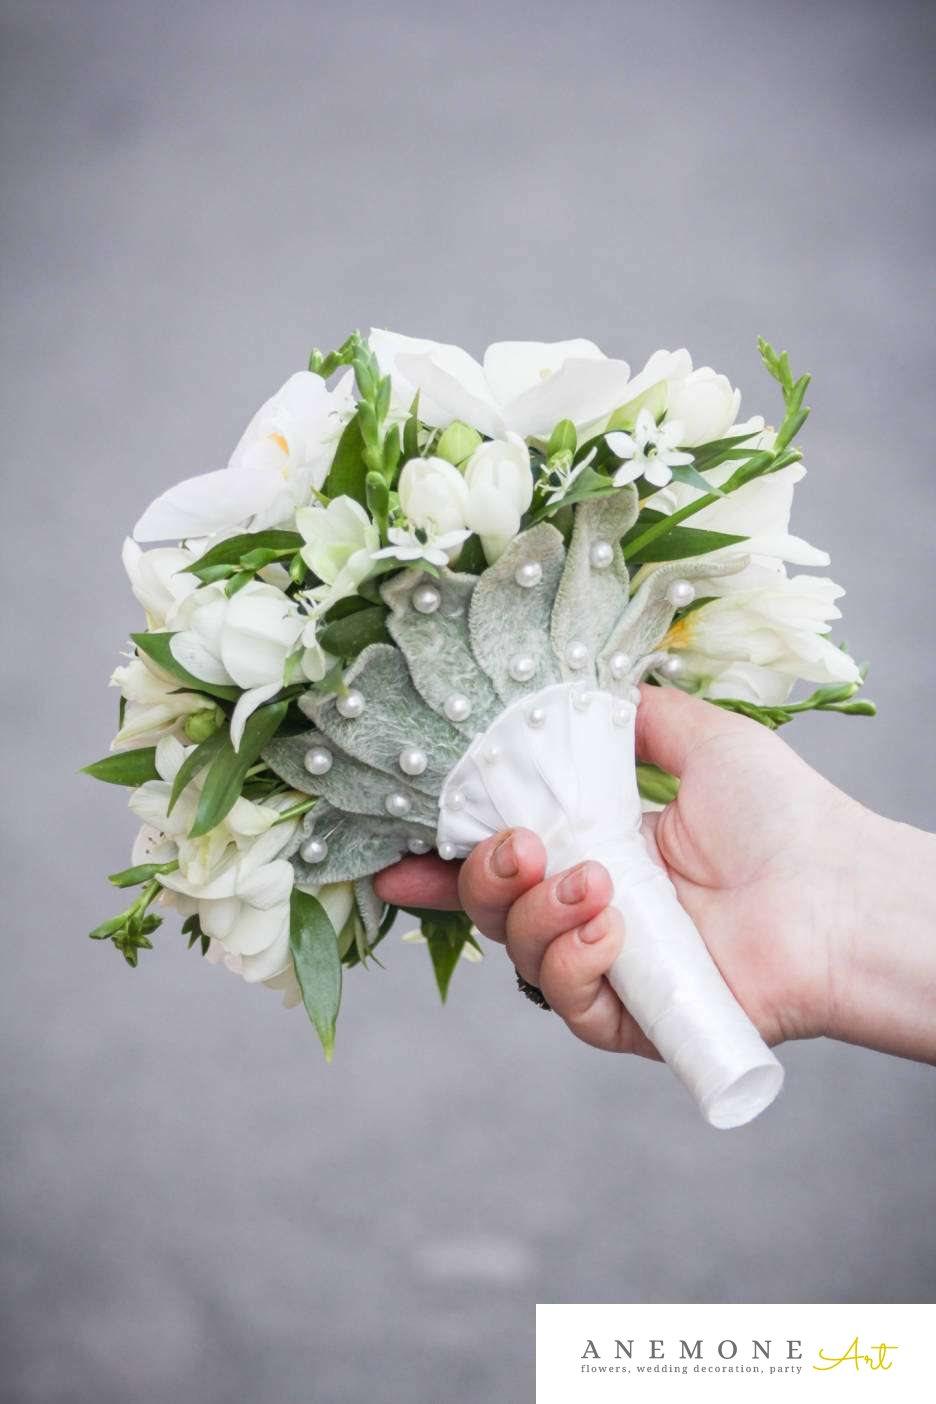 Poza, foto cu Flori de nunta buchet mireasa, frezii, lalele, maner buchet, orhidee in Arad, Timisoara, Oradea (wedding flowers, bouquets) nunta Arad, Timisoara, Oradea